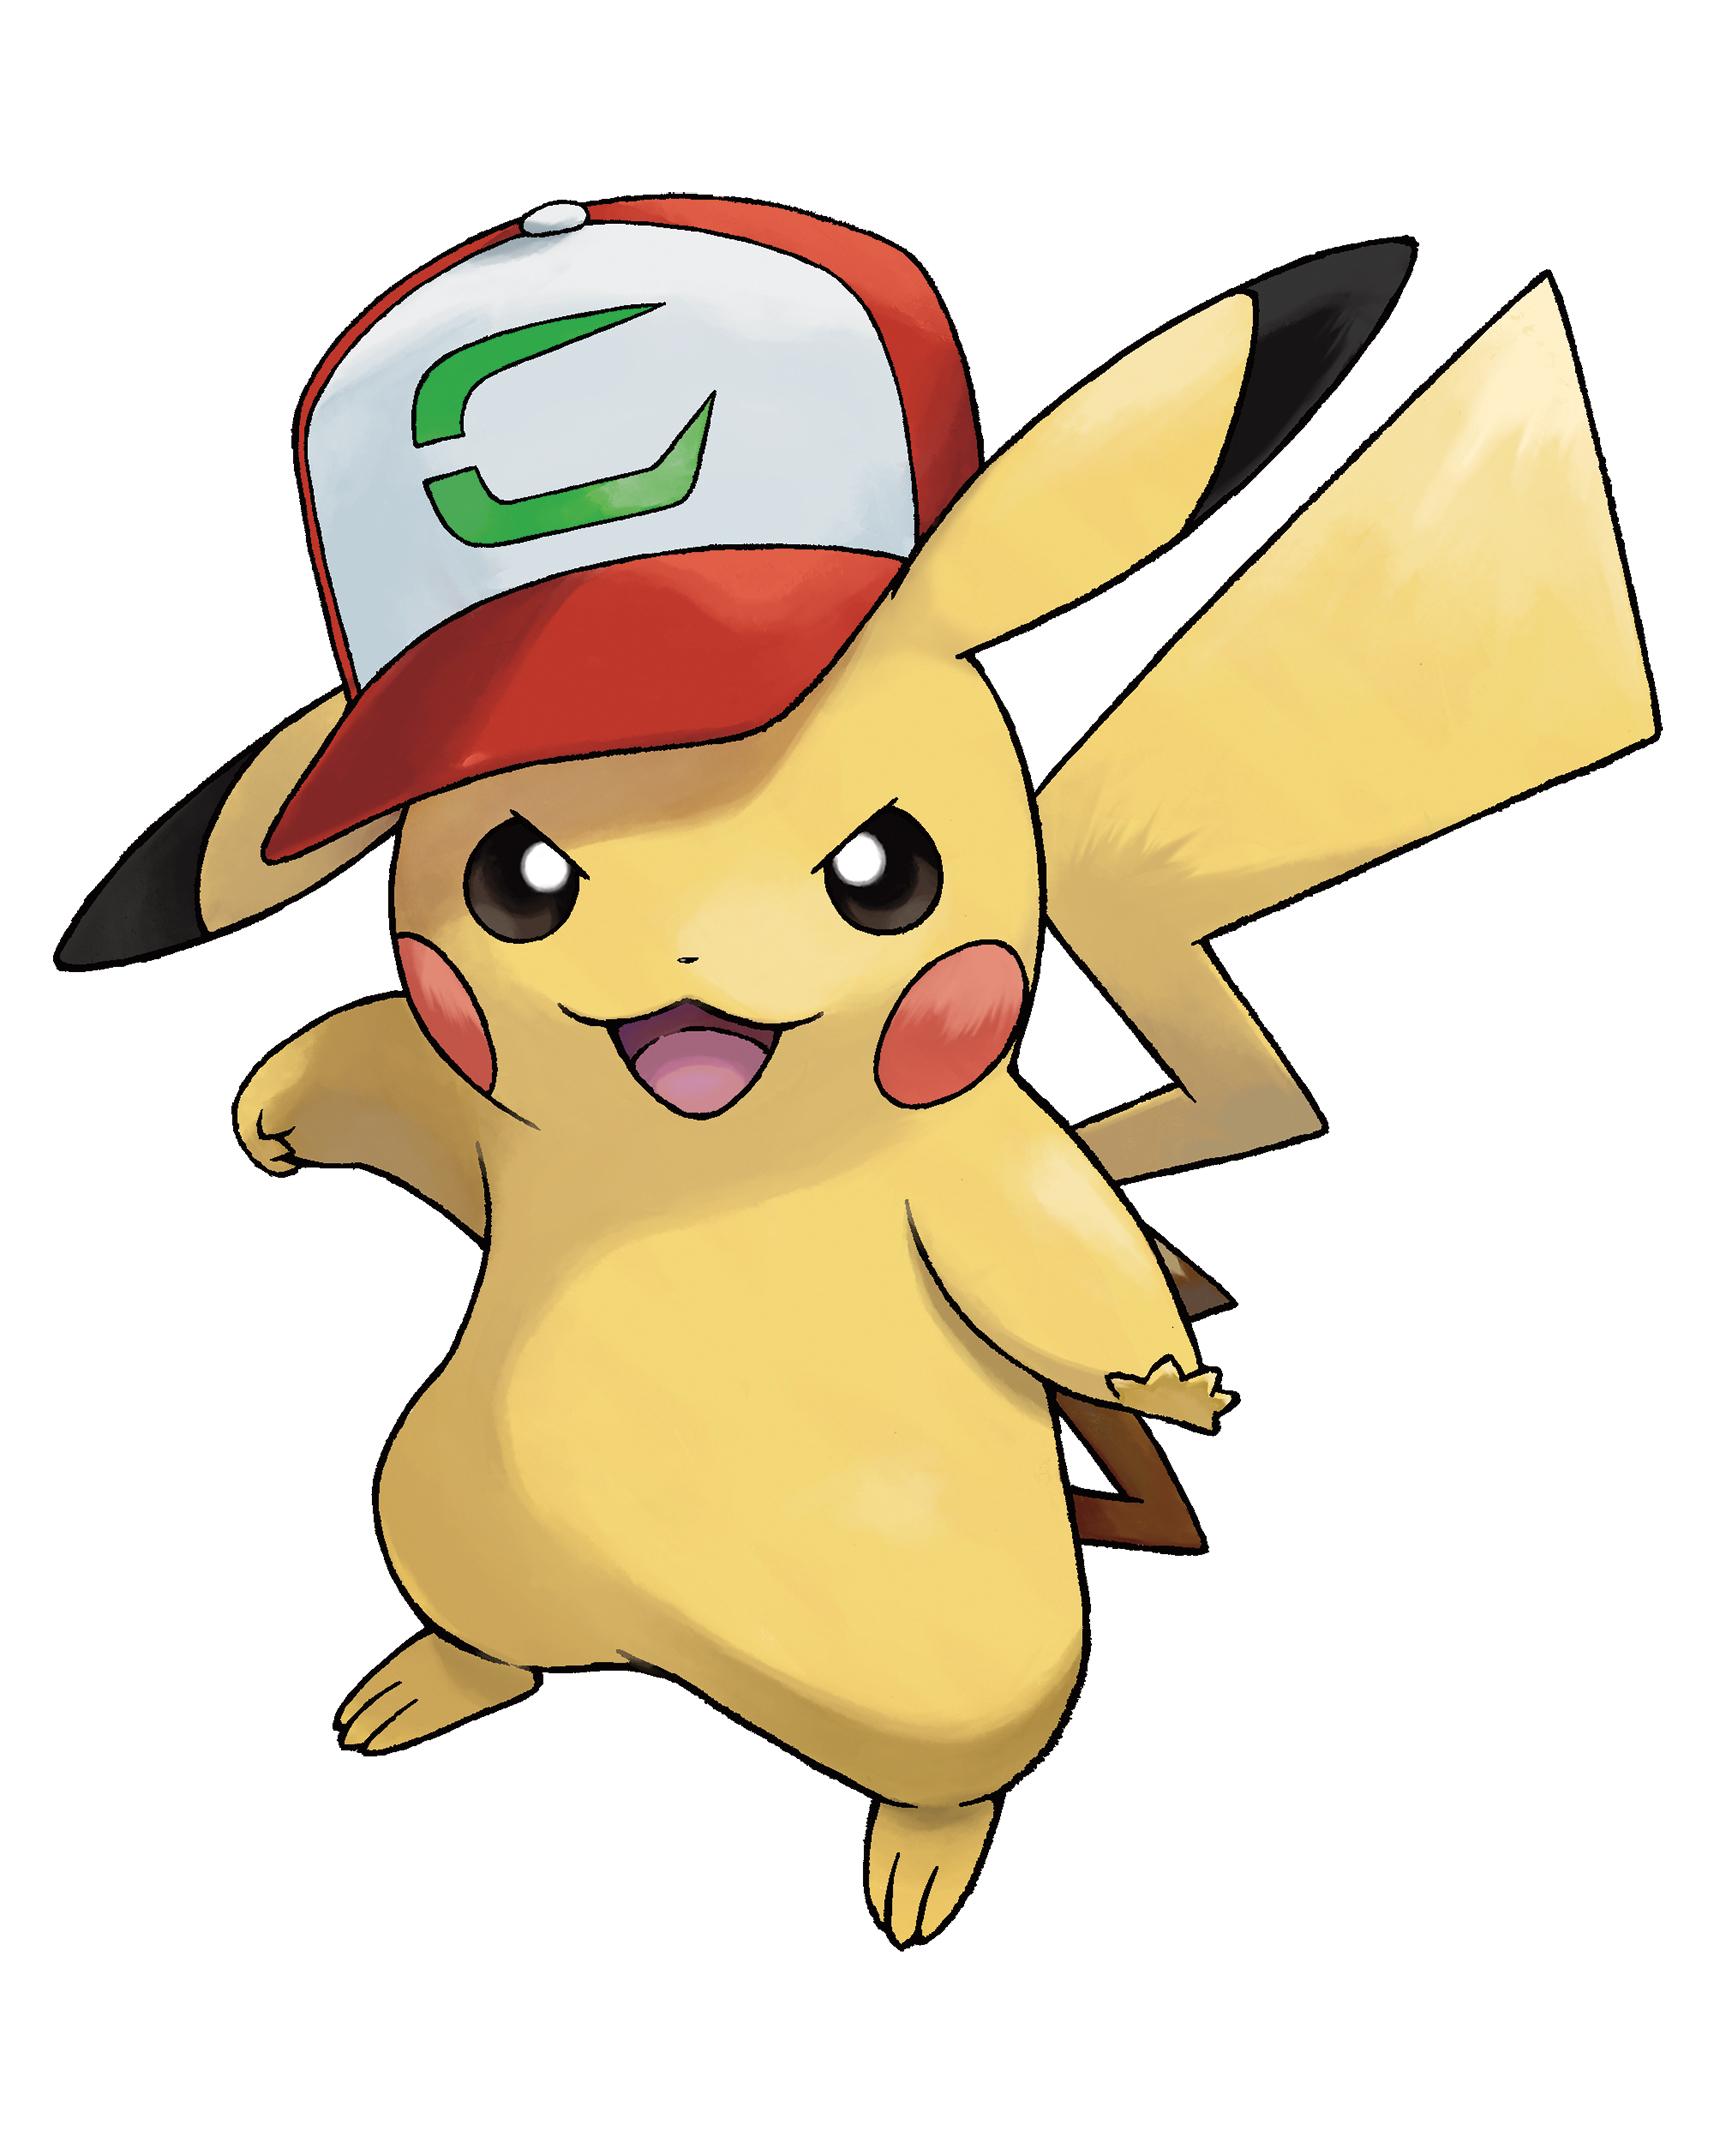 Pikachu film Pokémon : je te choisis